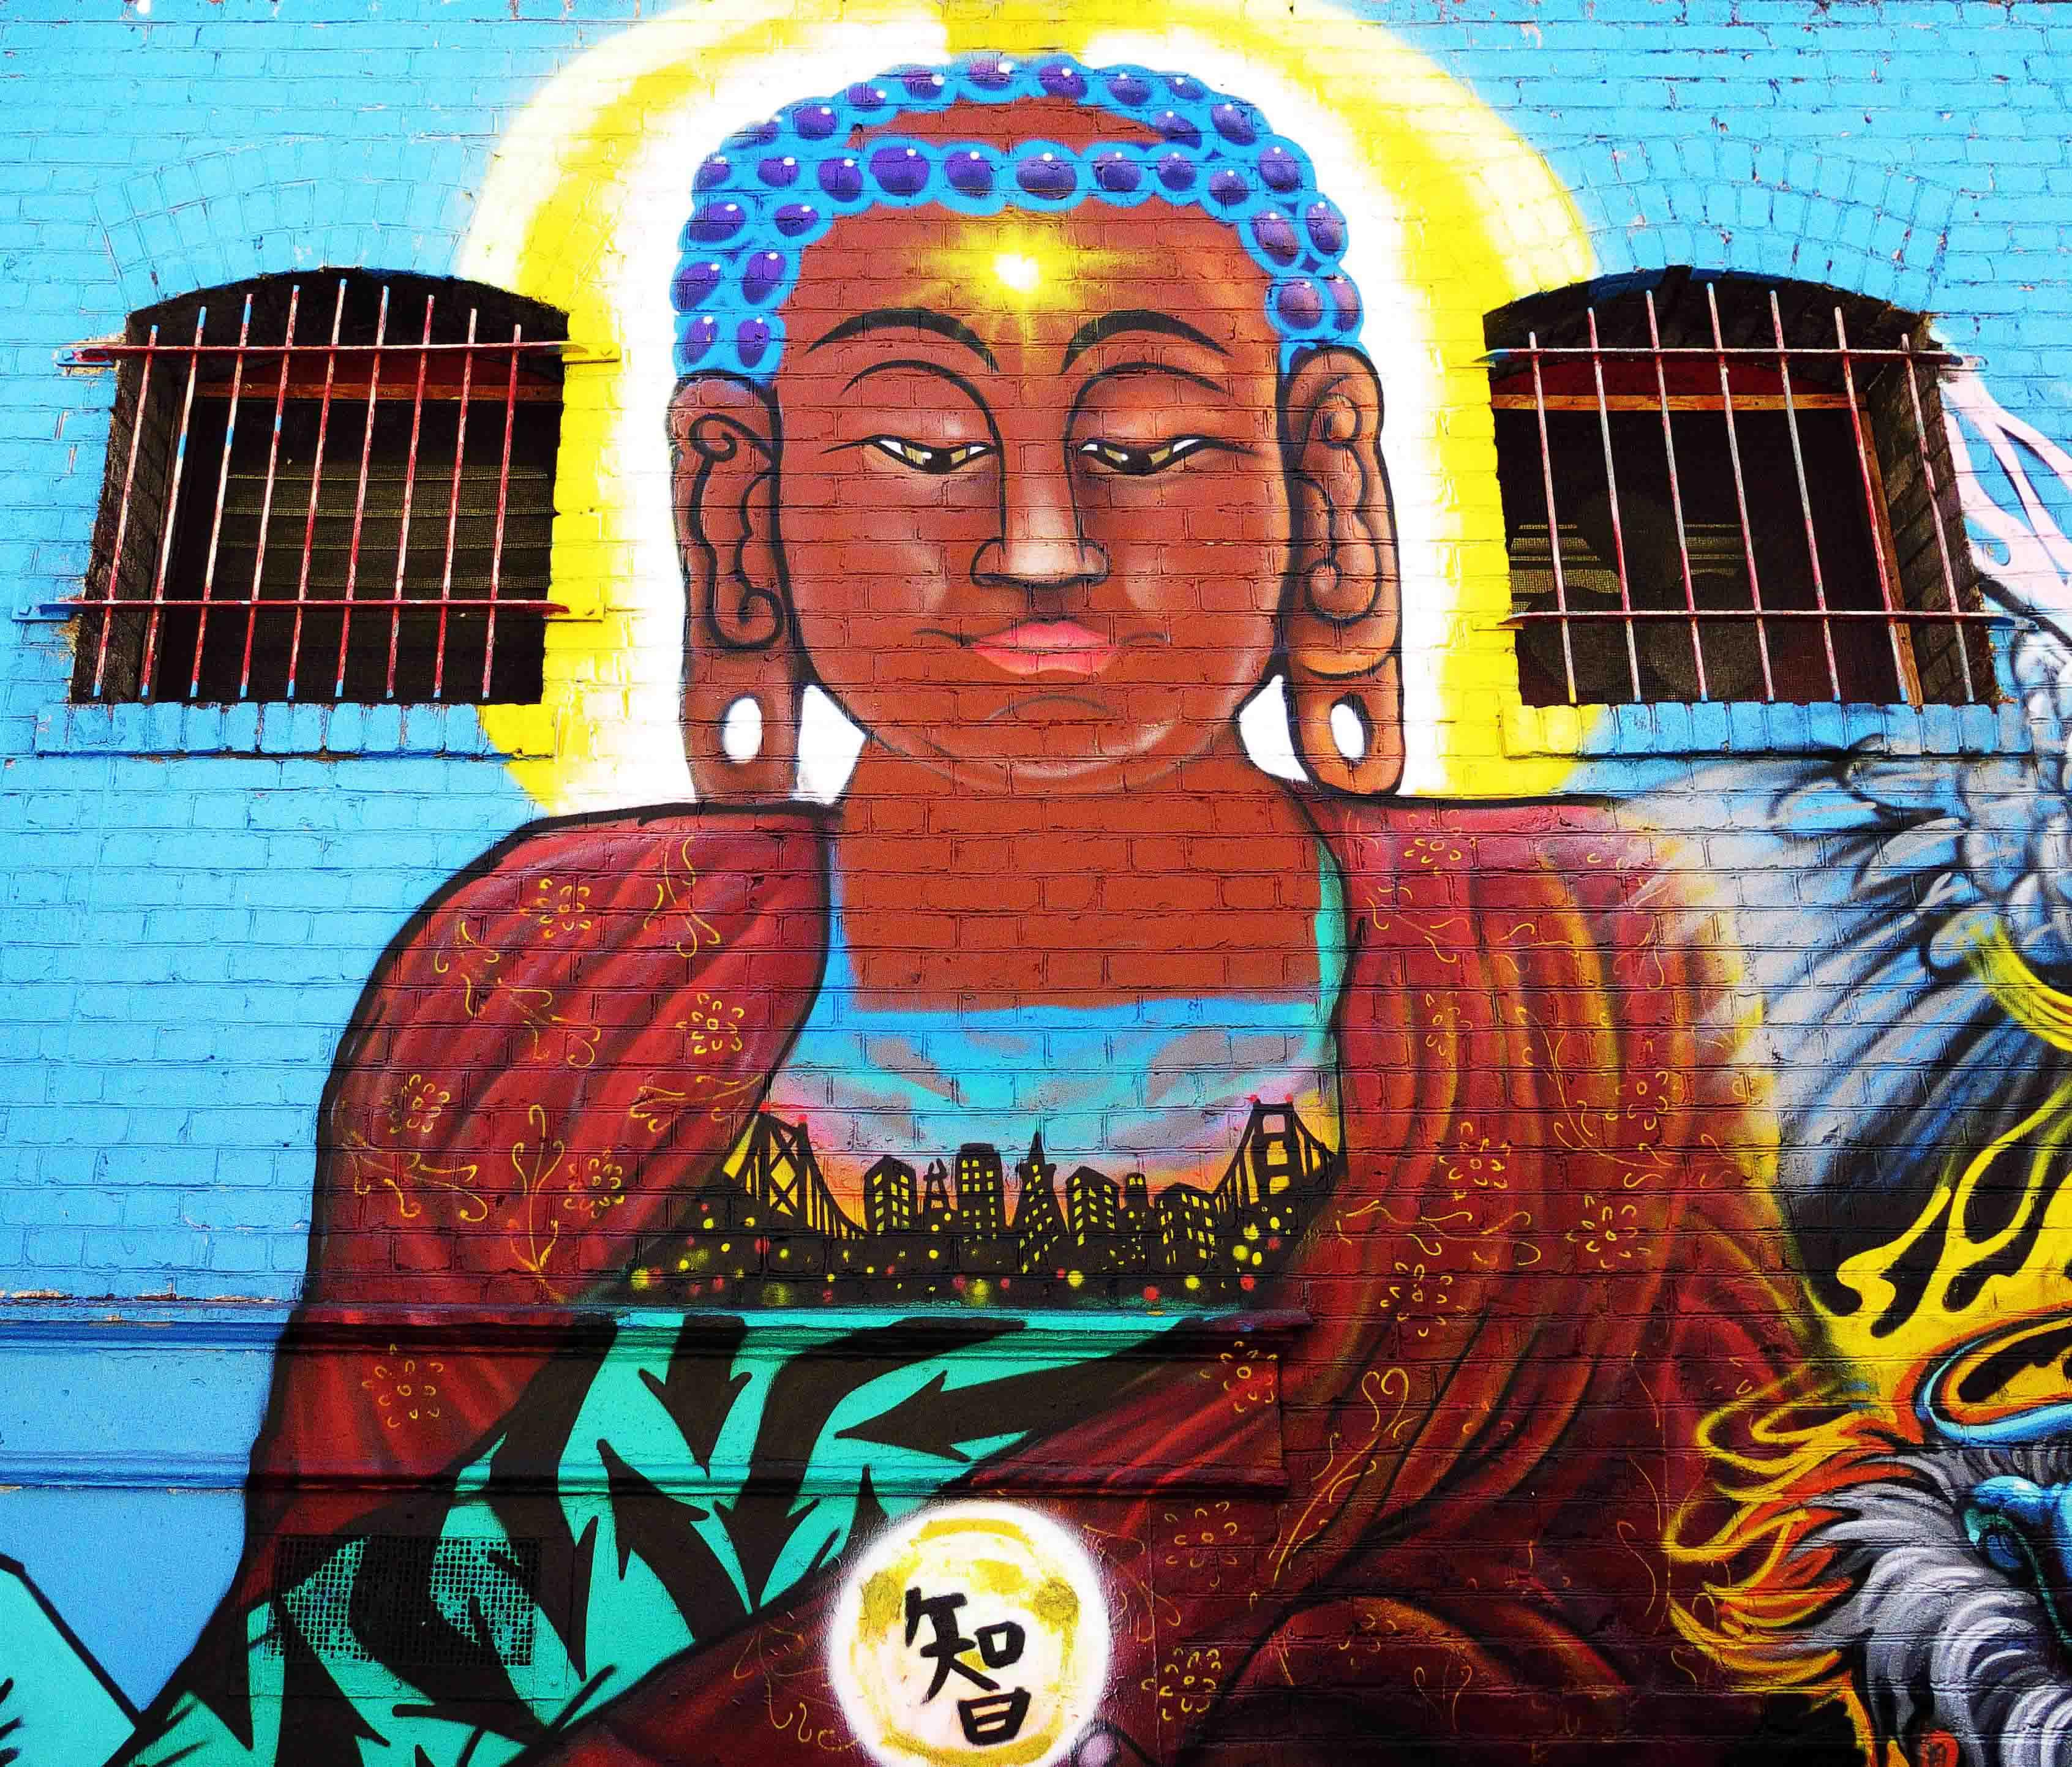 San Franciscos Graffiti War Cnn Travel